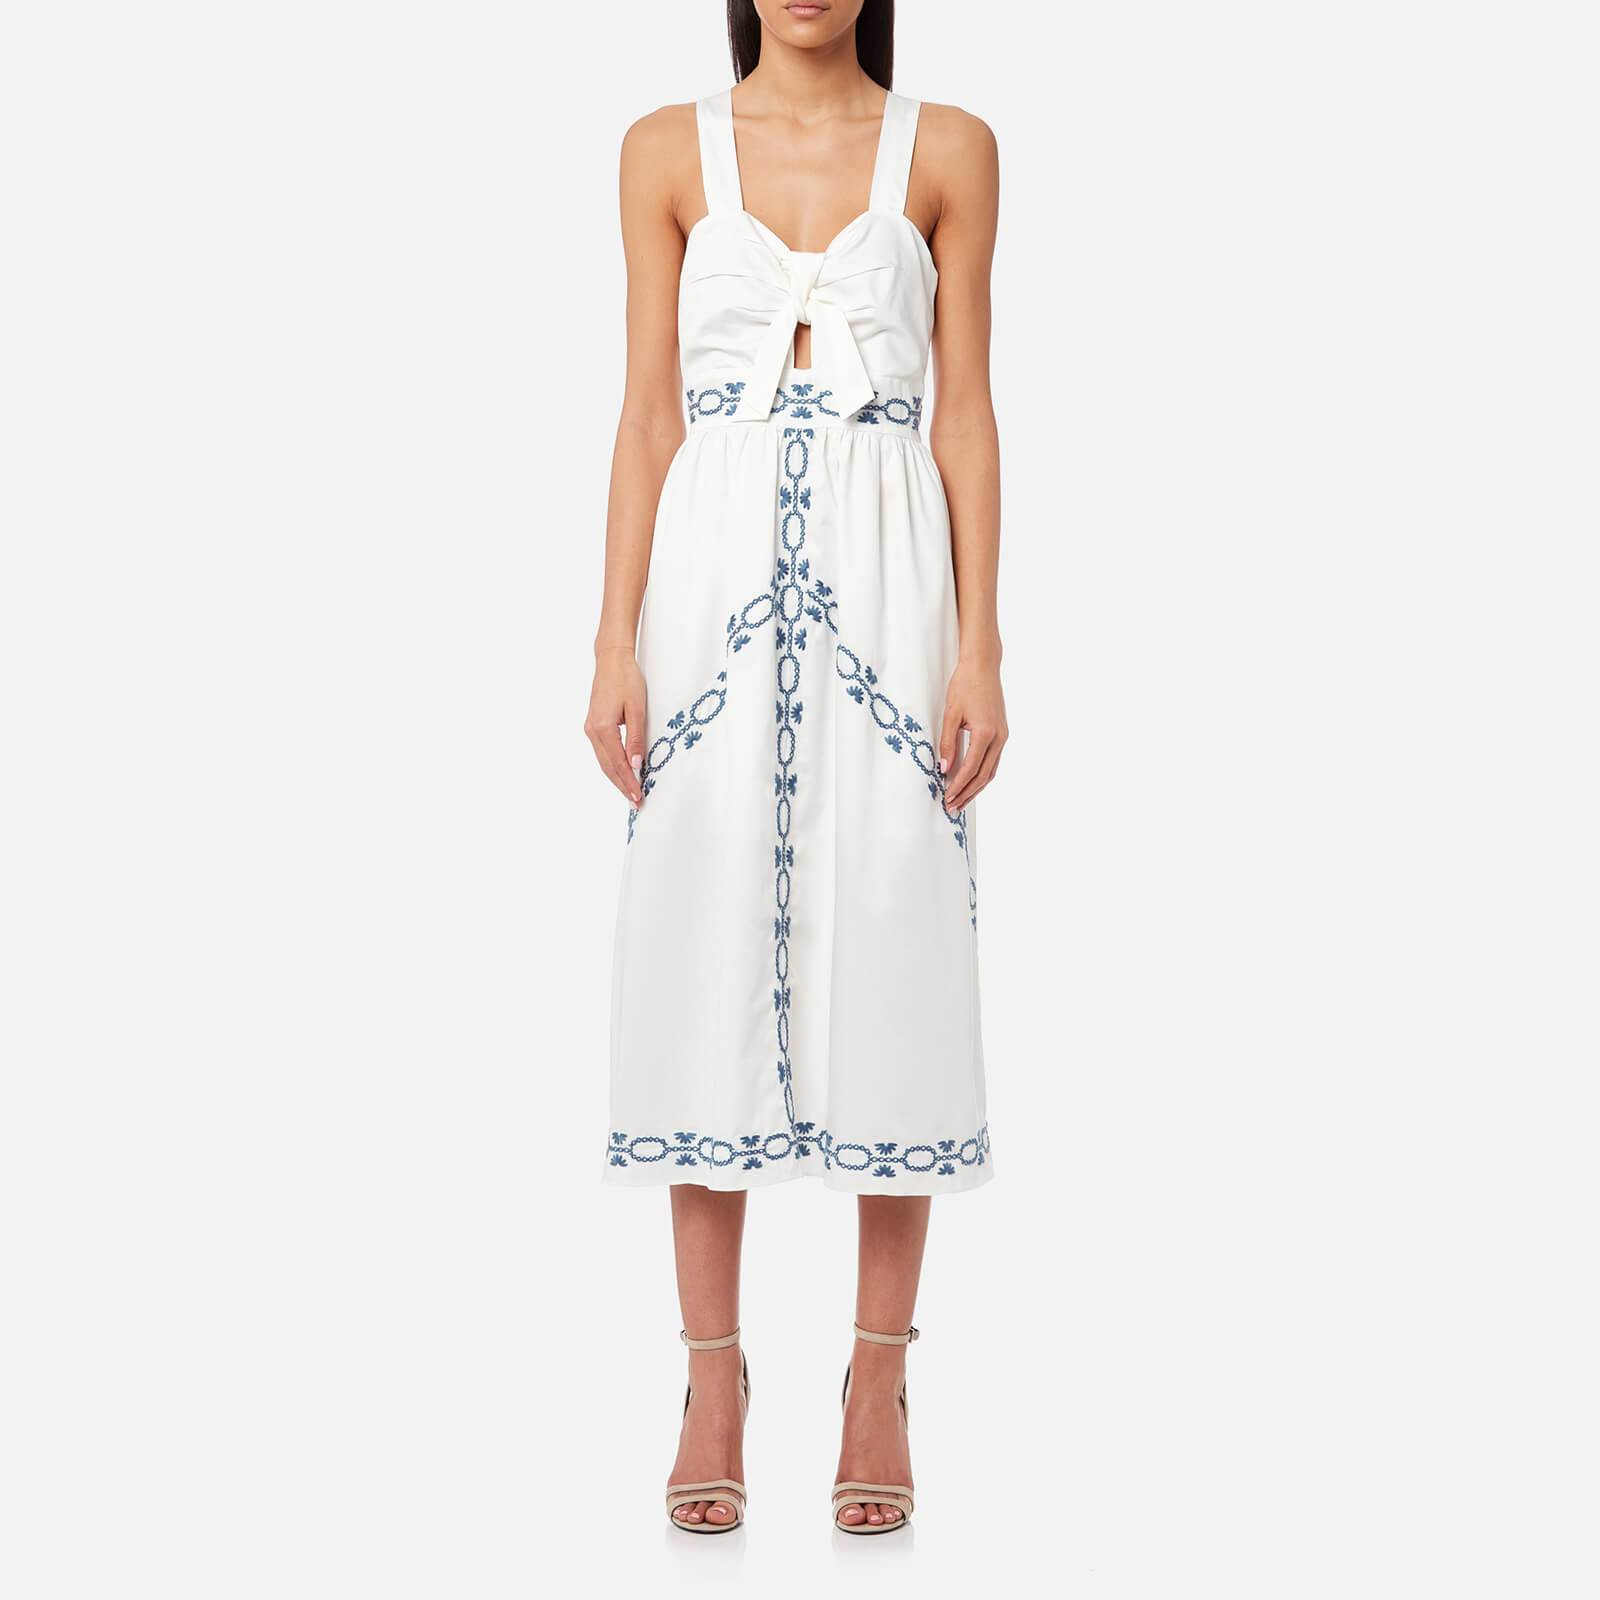 Foxiedox Women's Spellgirl Embroidery Midi Dress - White/Blue - S - White